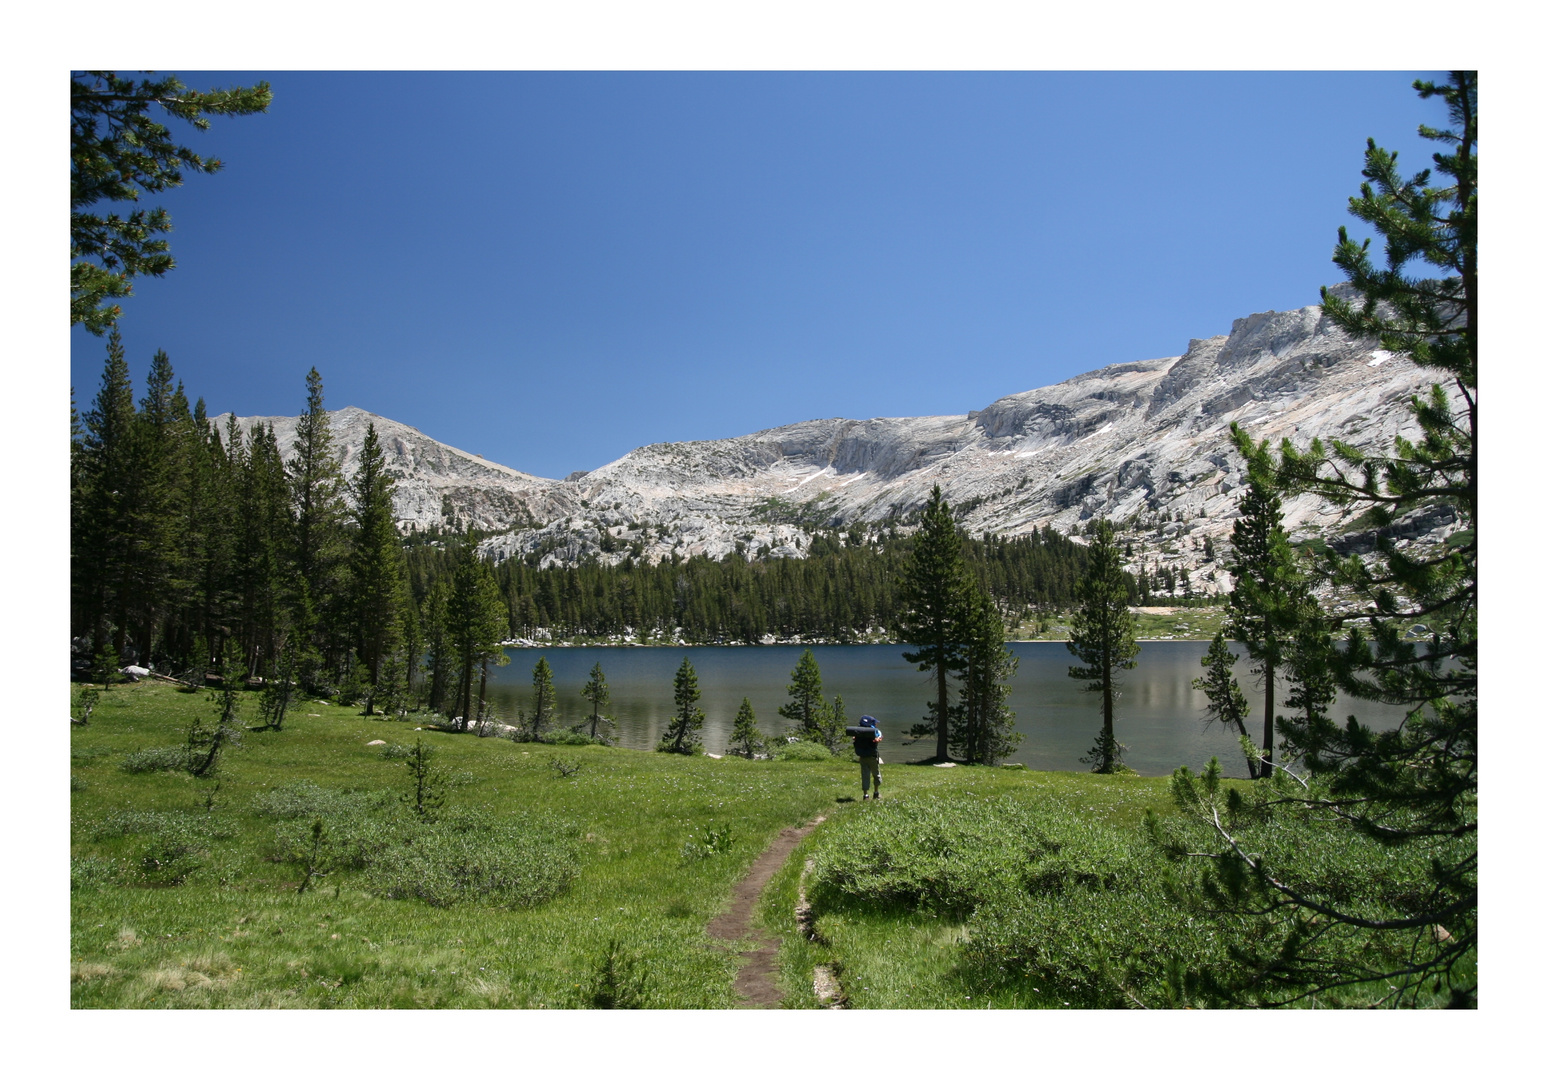 Yosemite Wilderness